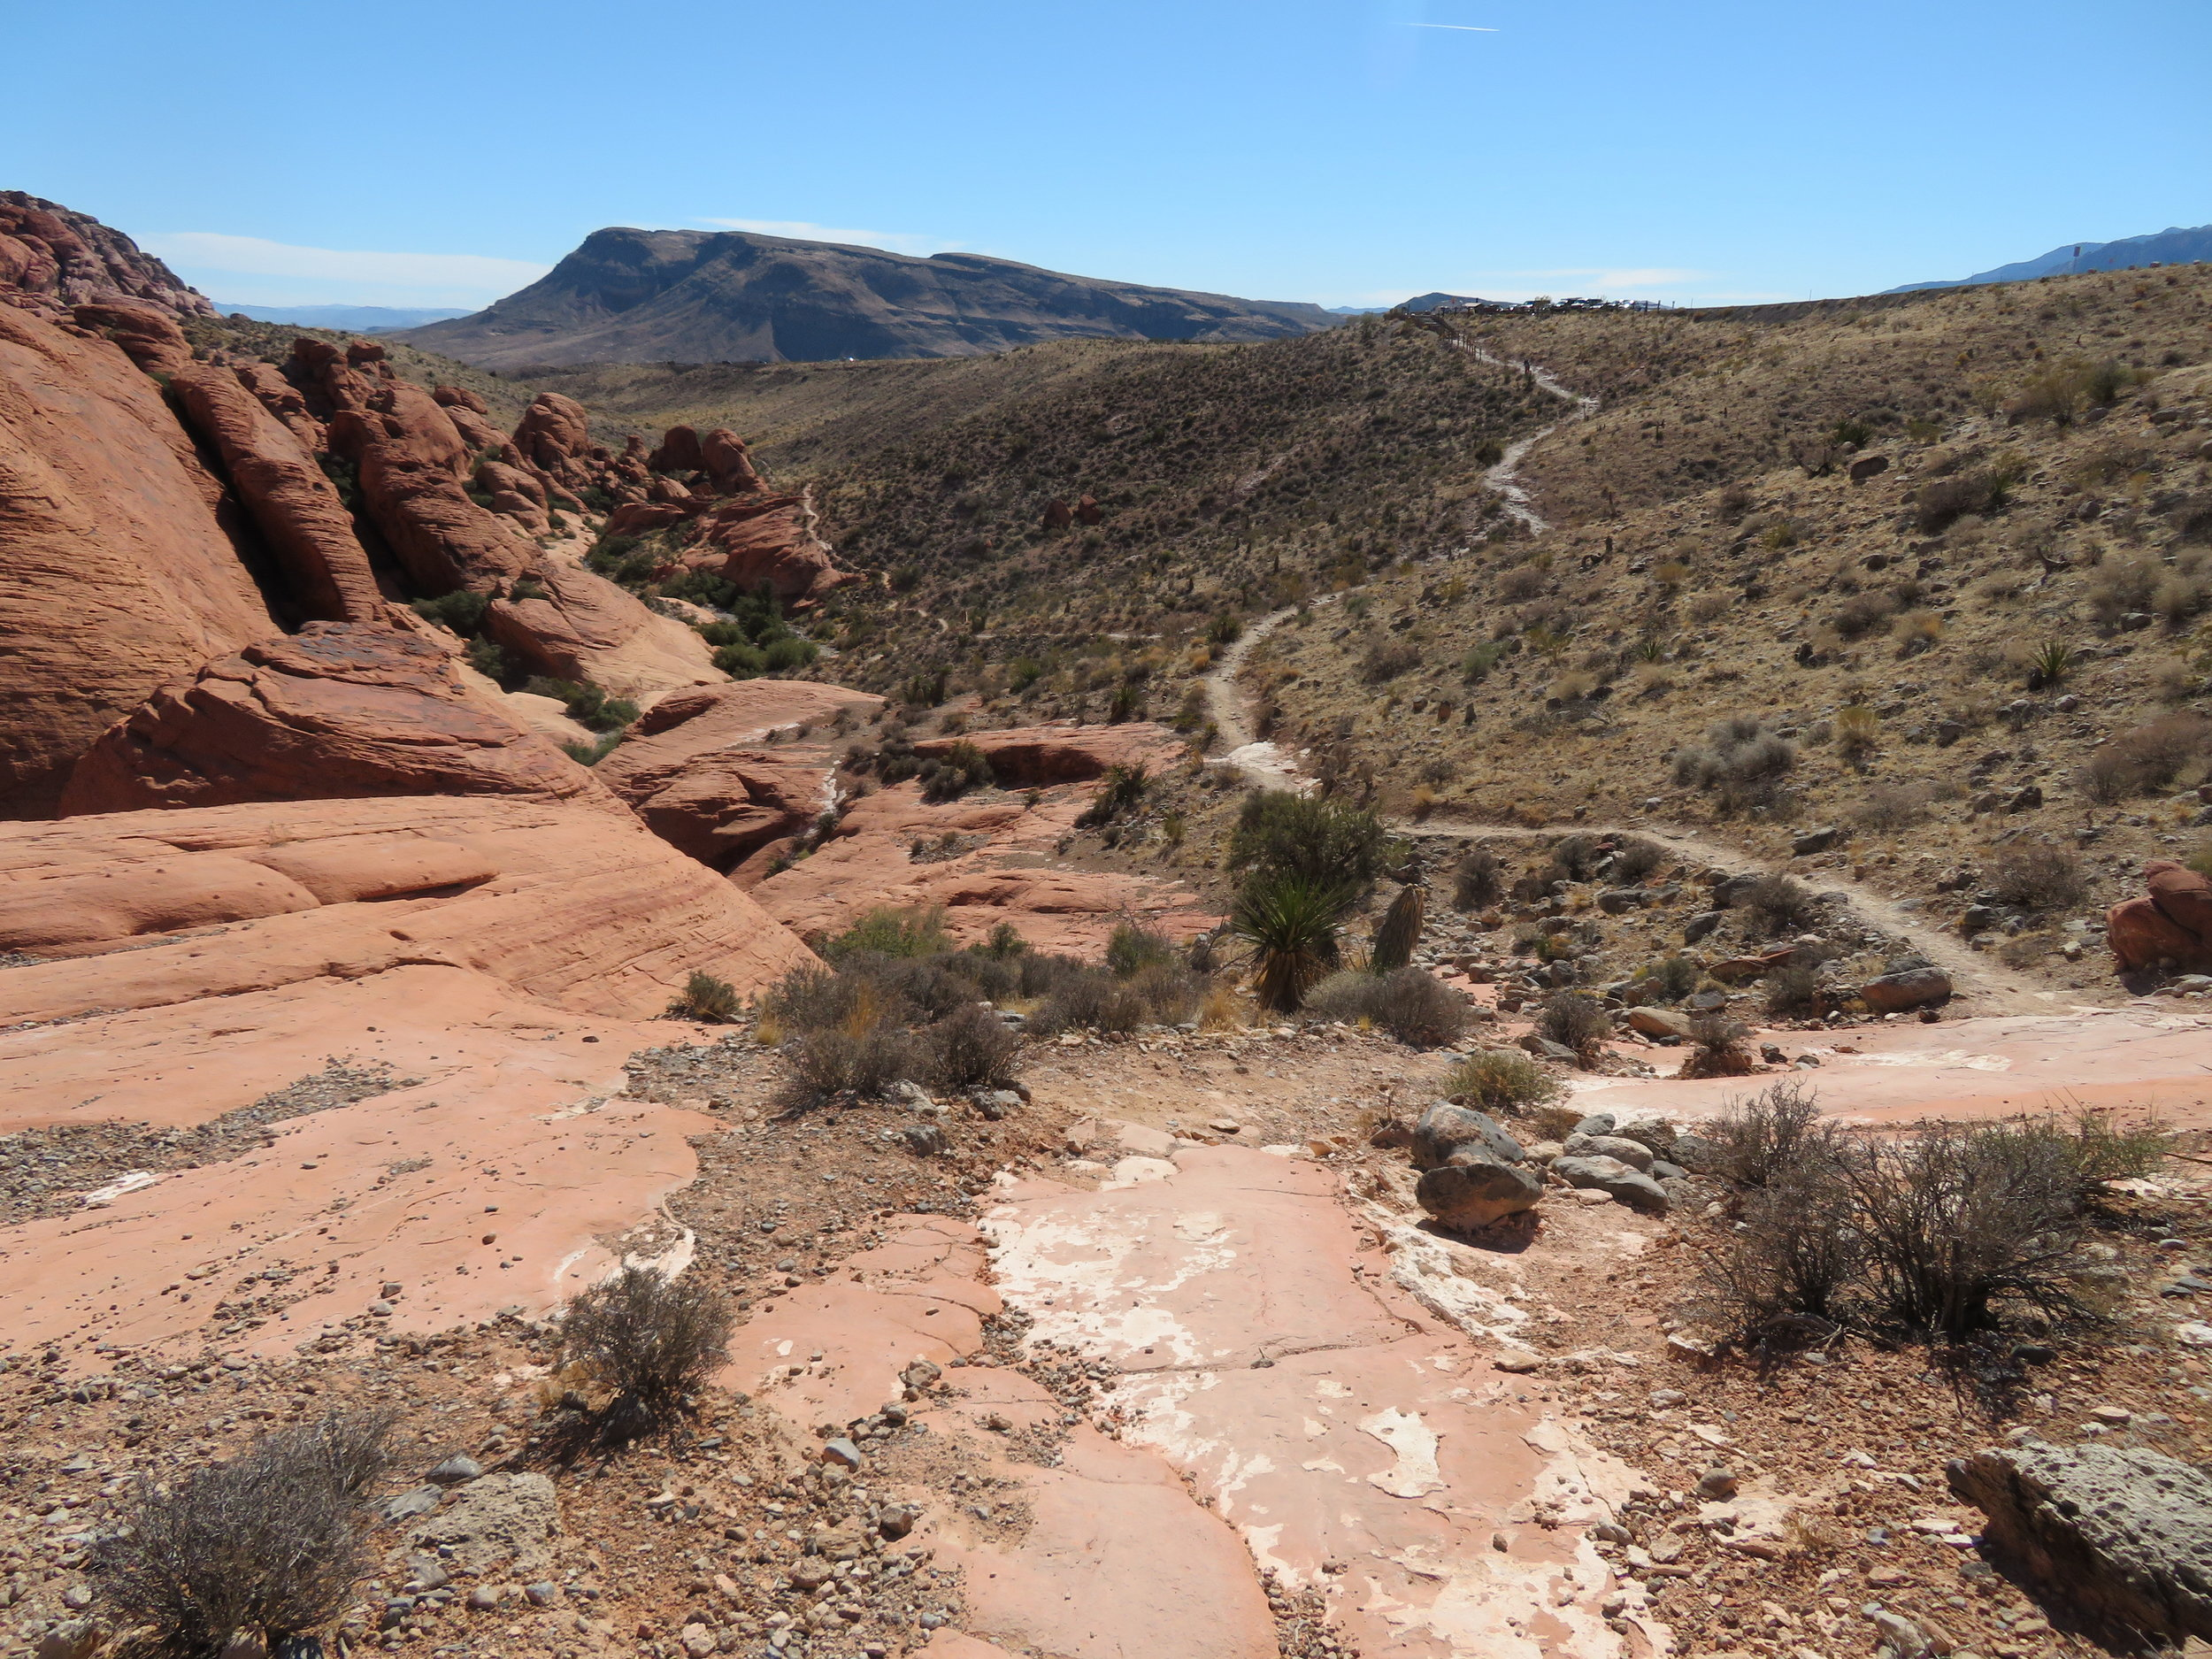 The Calico Hills trail was sheer pleasure to walk.